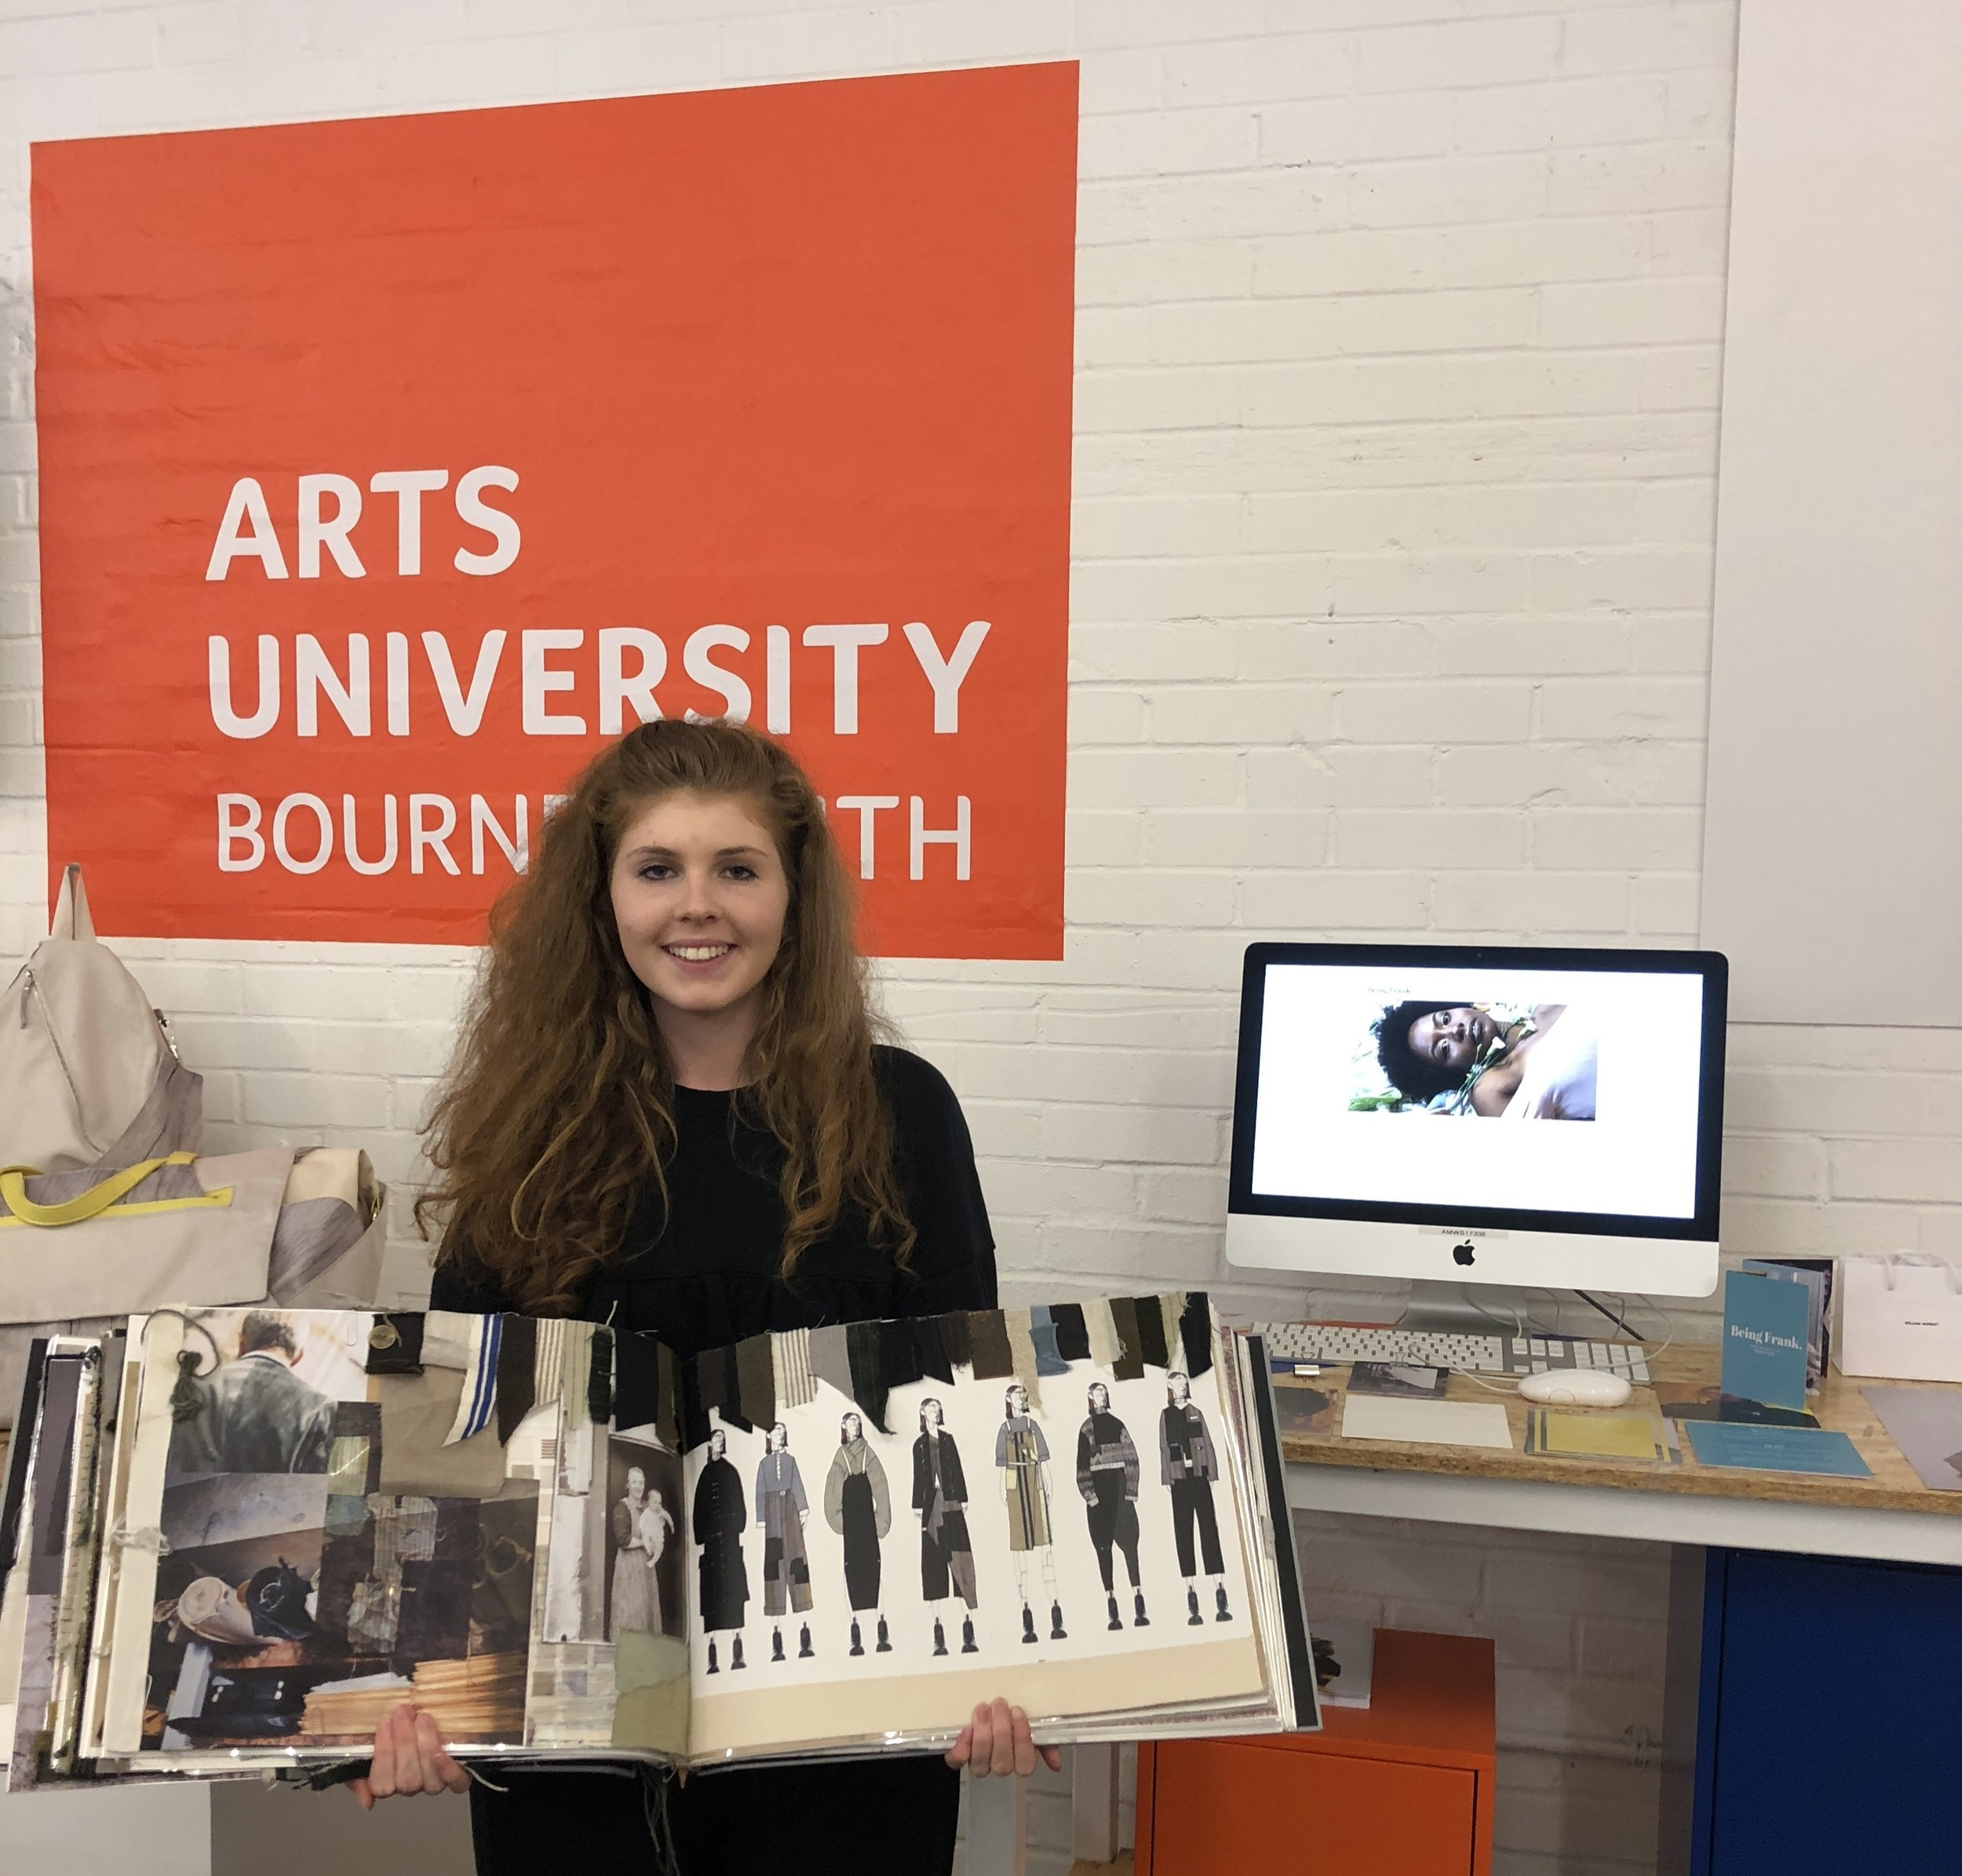 Rebecca Wilson. BA Fashion Graduate, Bournemouth University Talks to www.Texintel.com